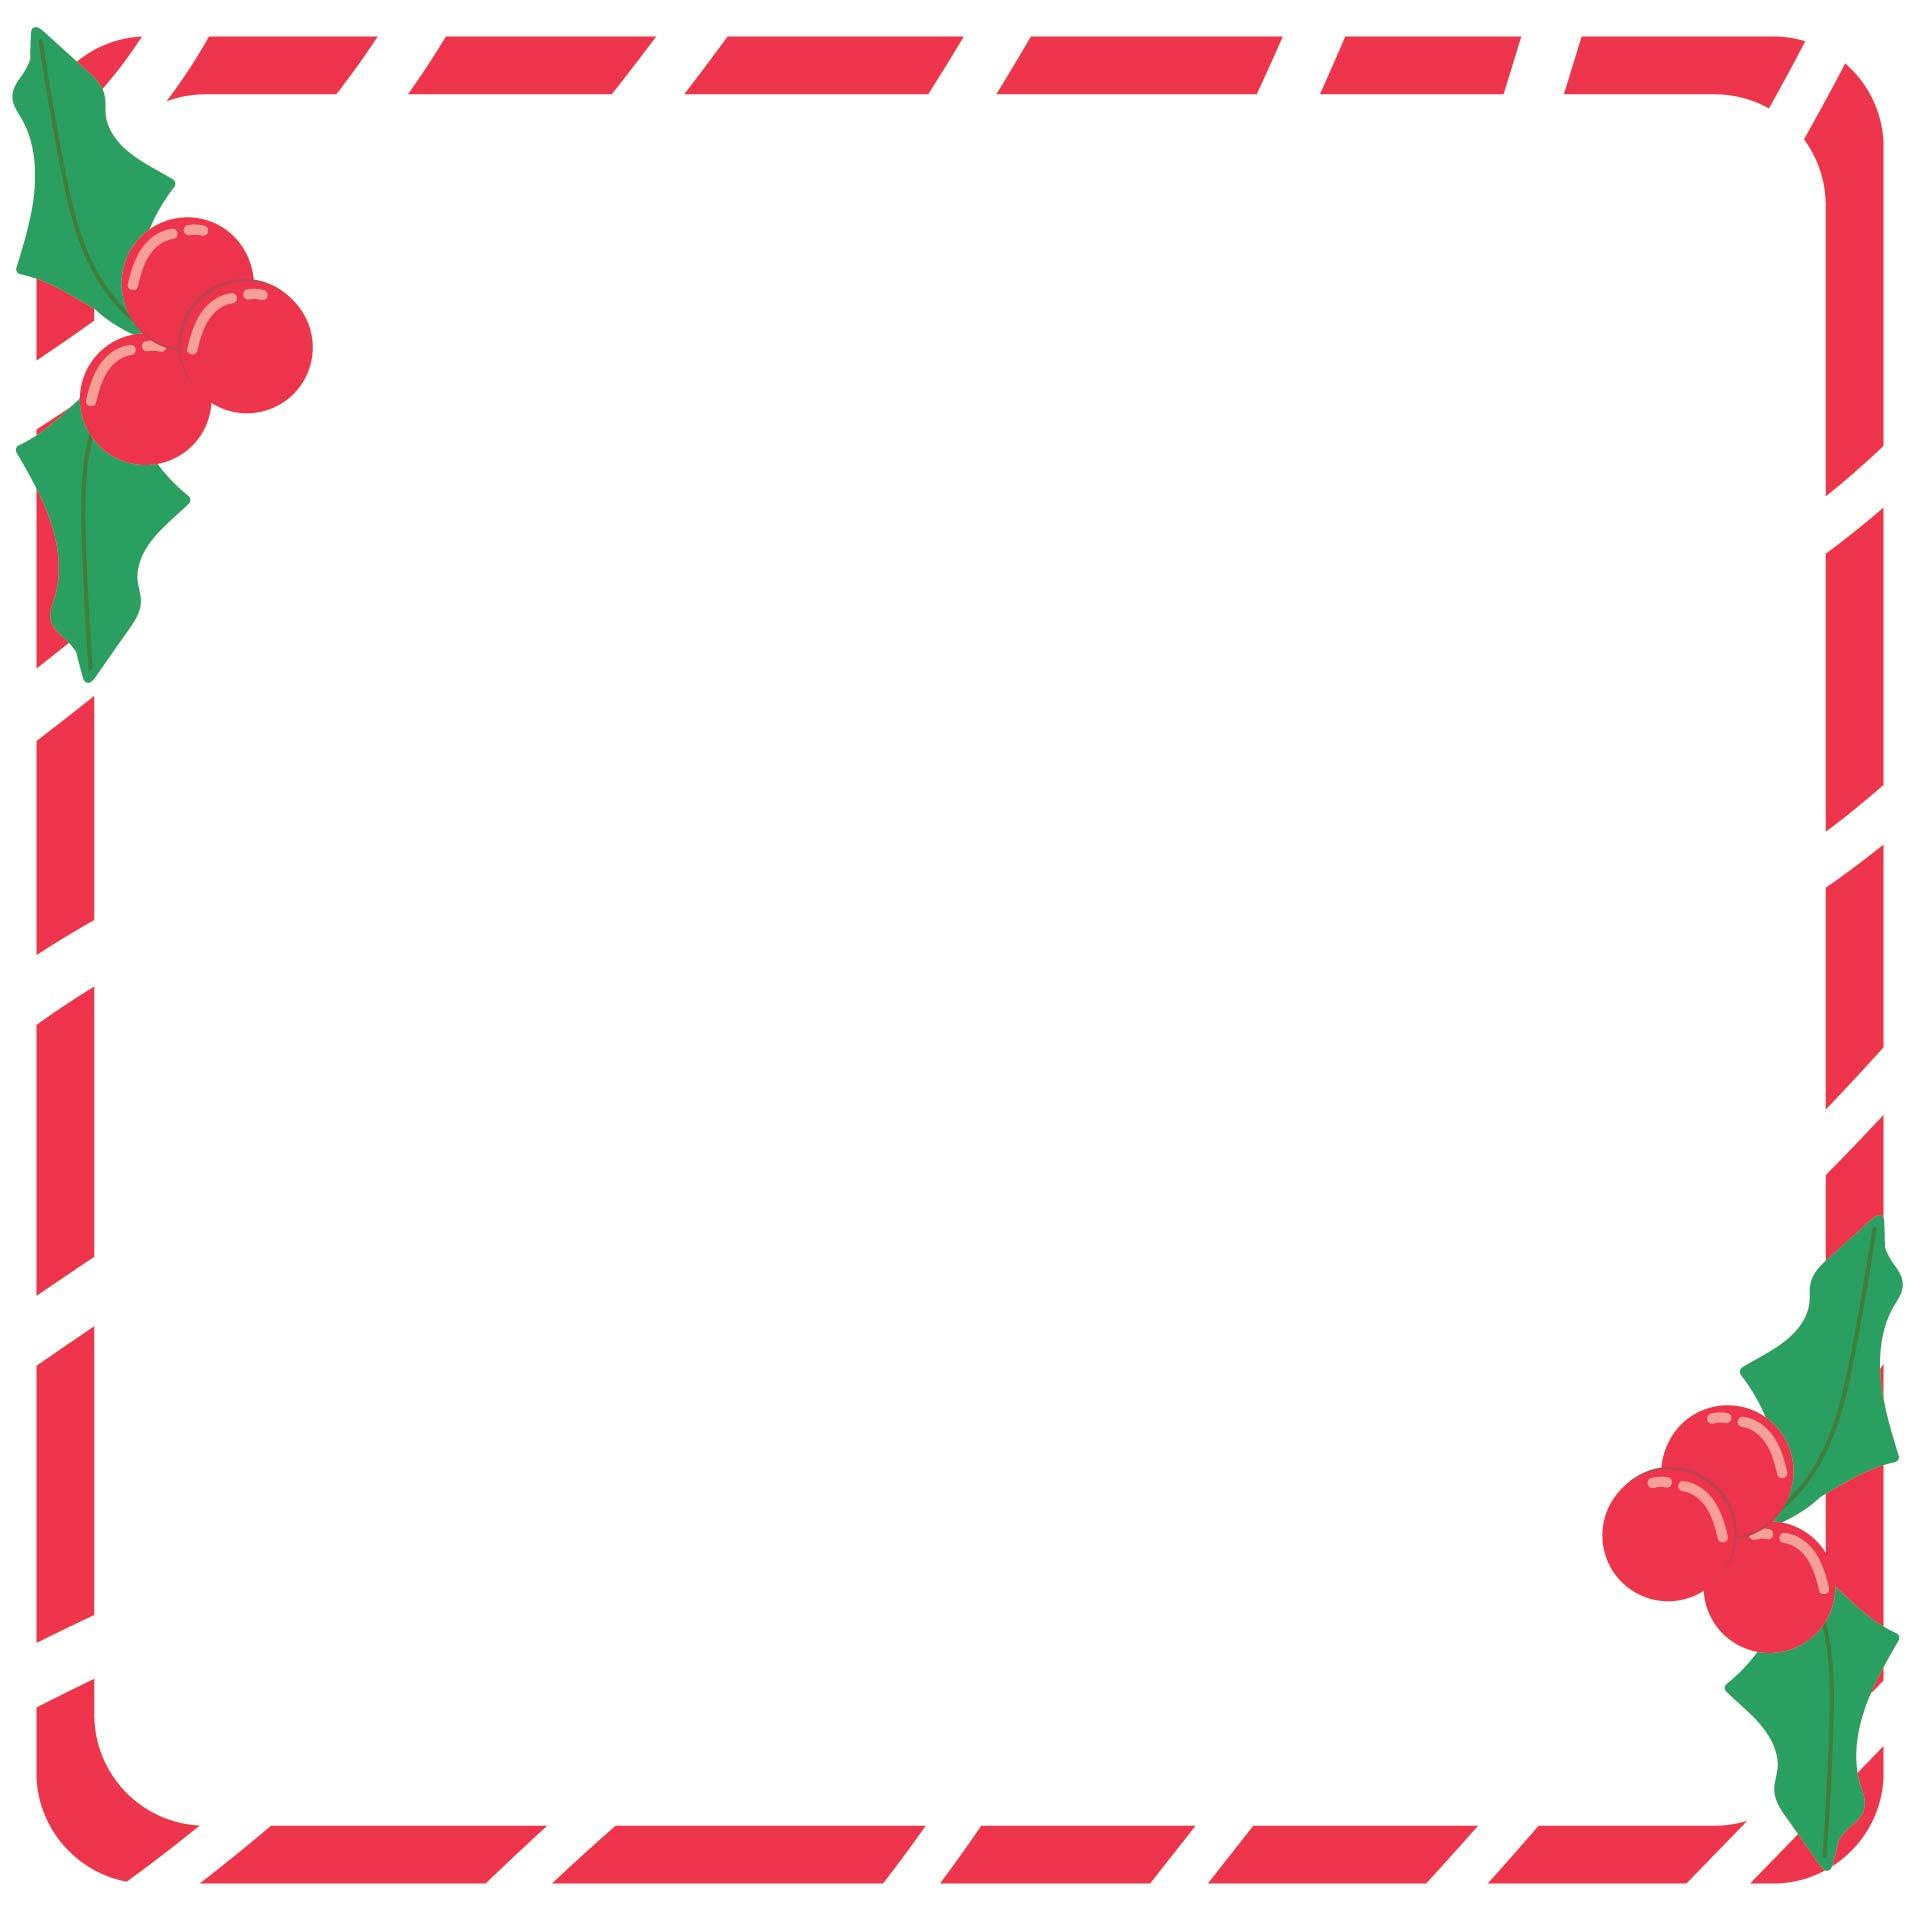 Christmas Stationery Border